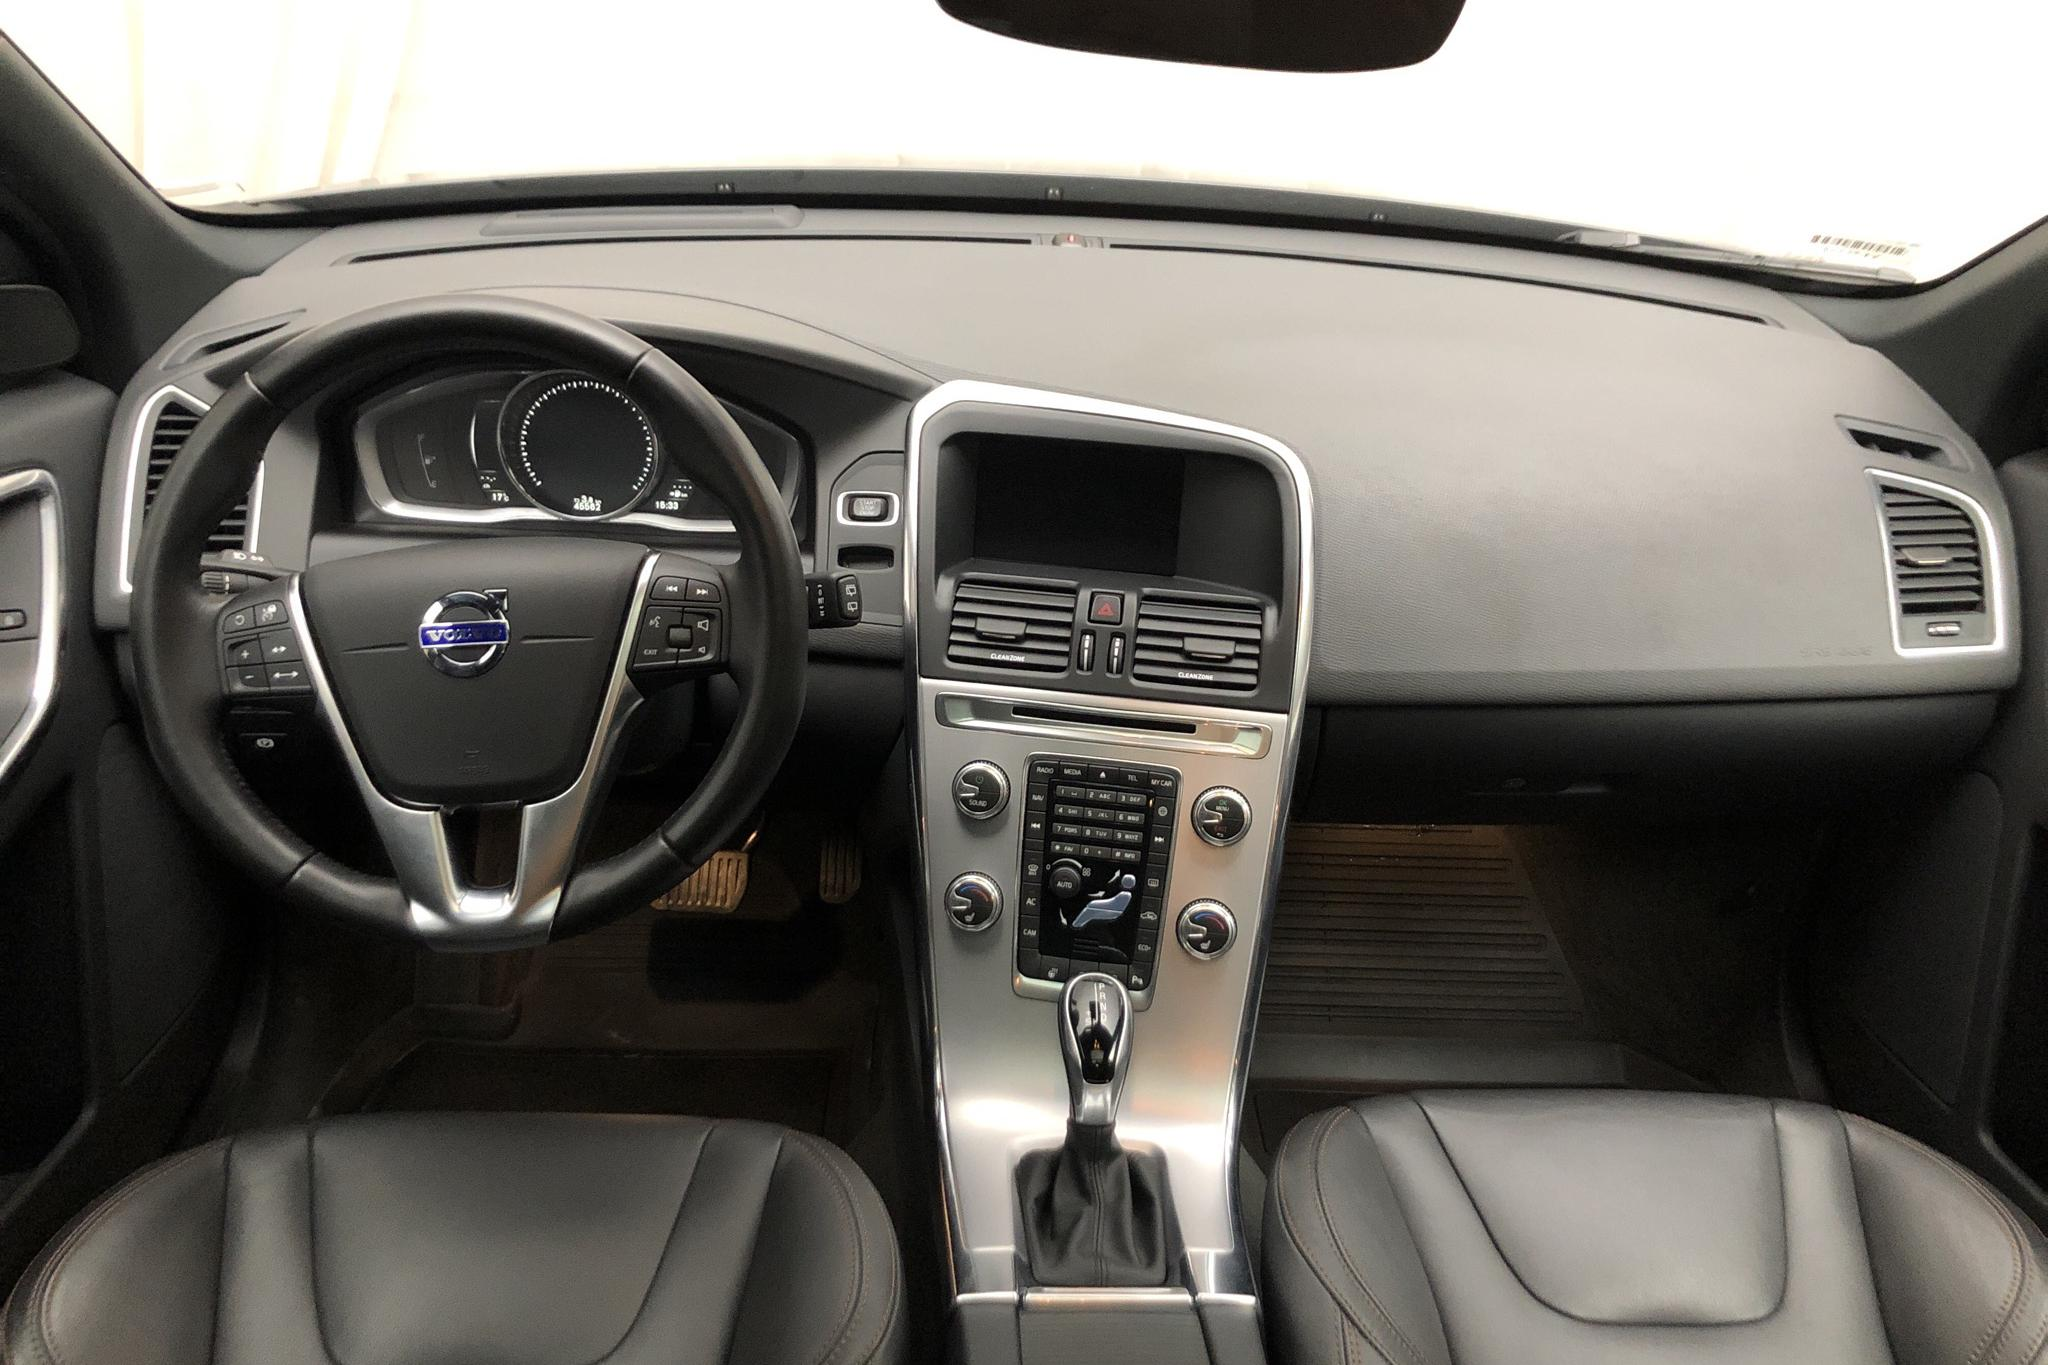 Volvo XC60 D4 2WD (190hk) - 4 555 mil - Automat - grå - 2017